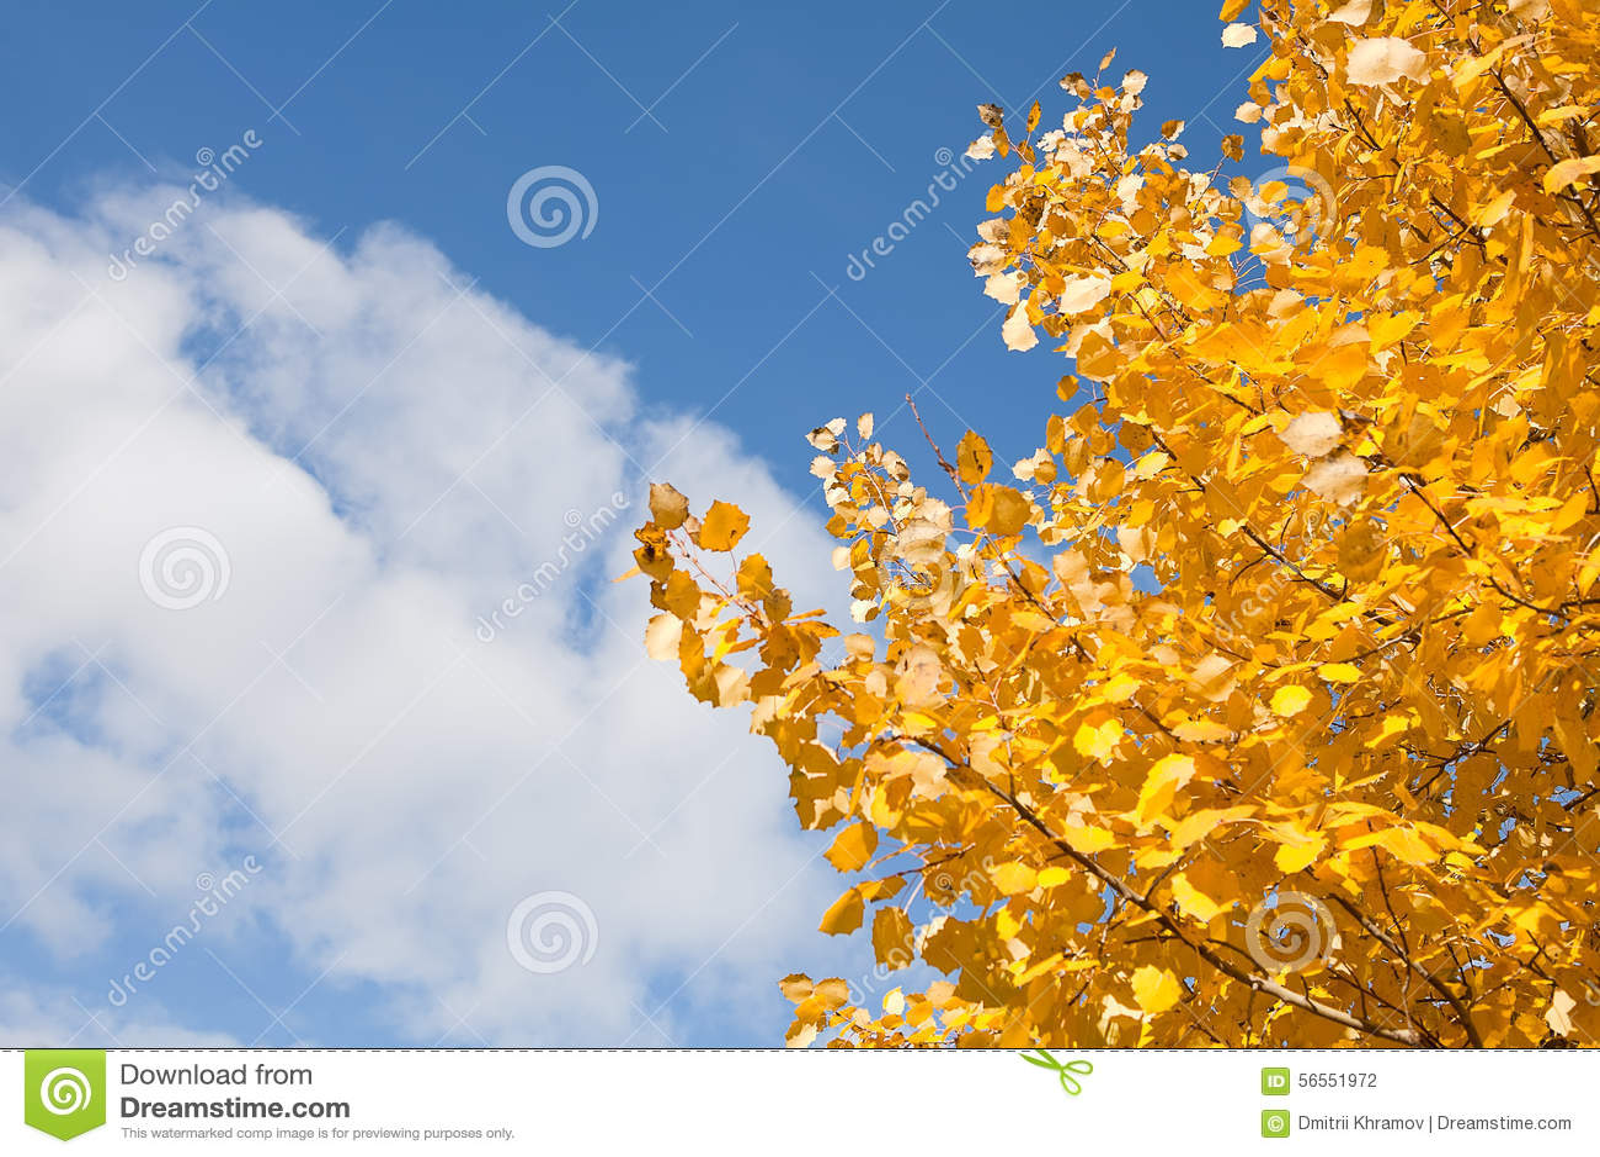 Download Φύλλα φθινοπώρου ενάντια στο μπλε ουρανό Στοκ Εικόνες - εικόνα από χρωματισμένος, βακκινίων: 56551972